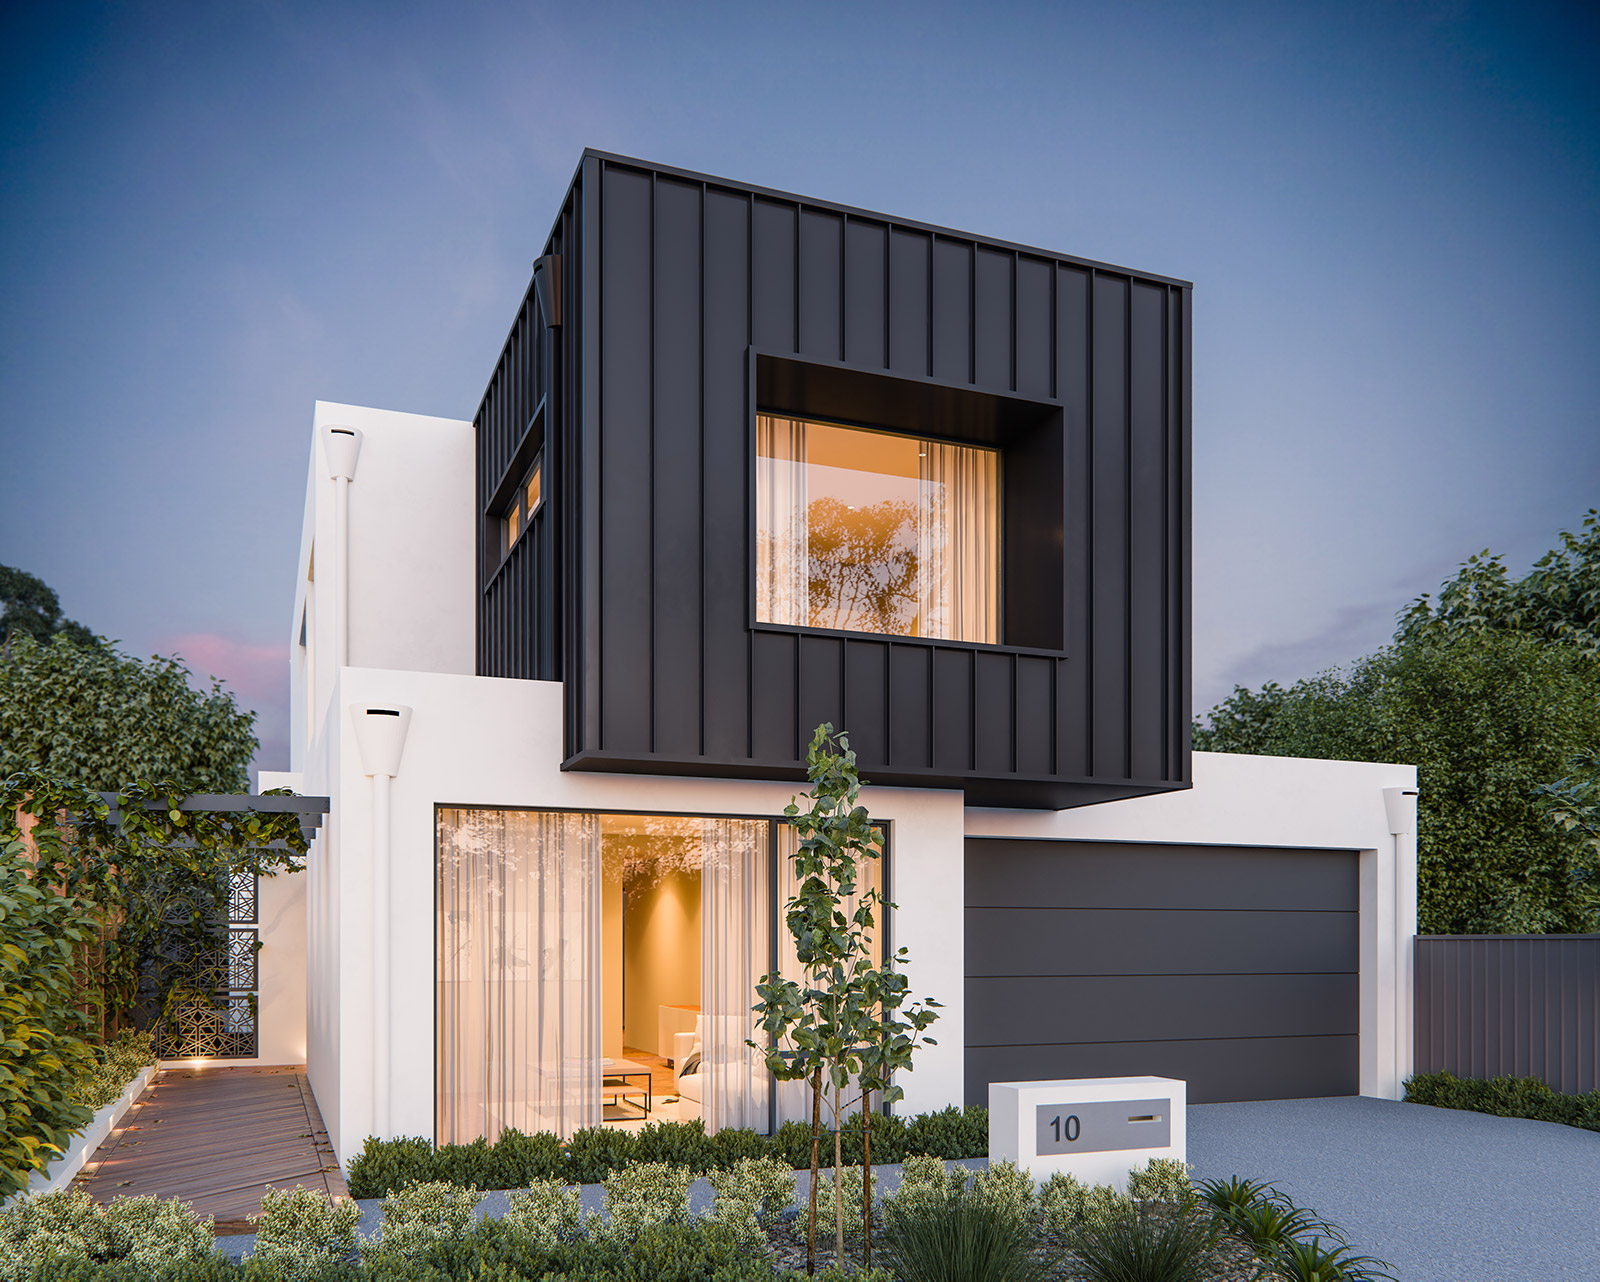 ScreenAge-3d-rendering-house-perth-facade